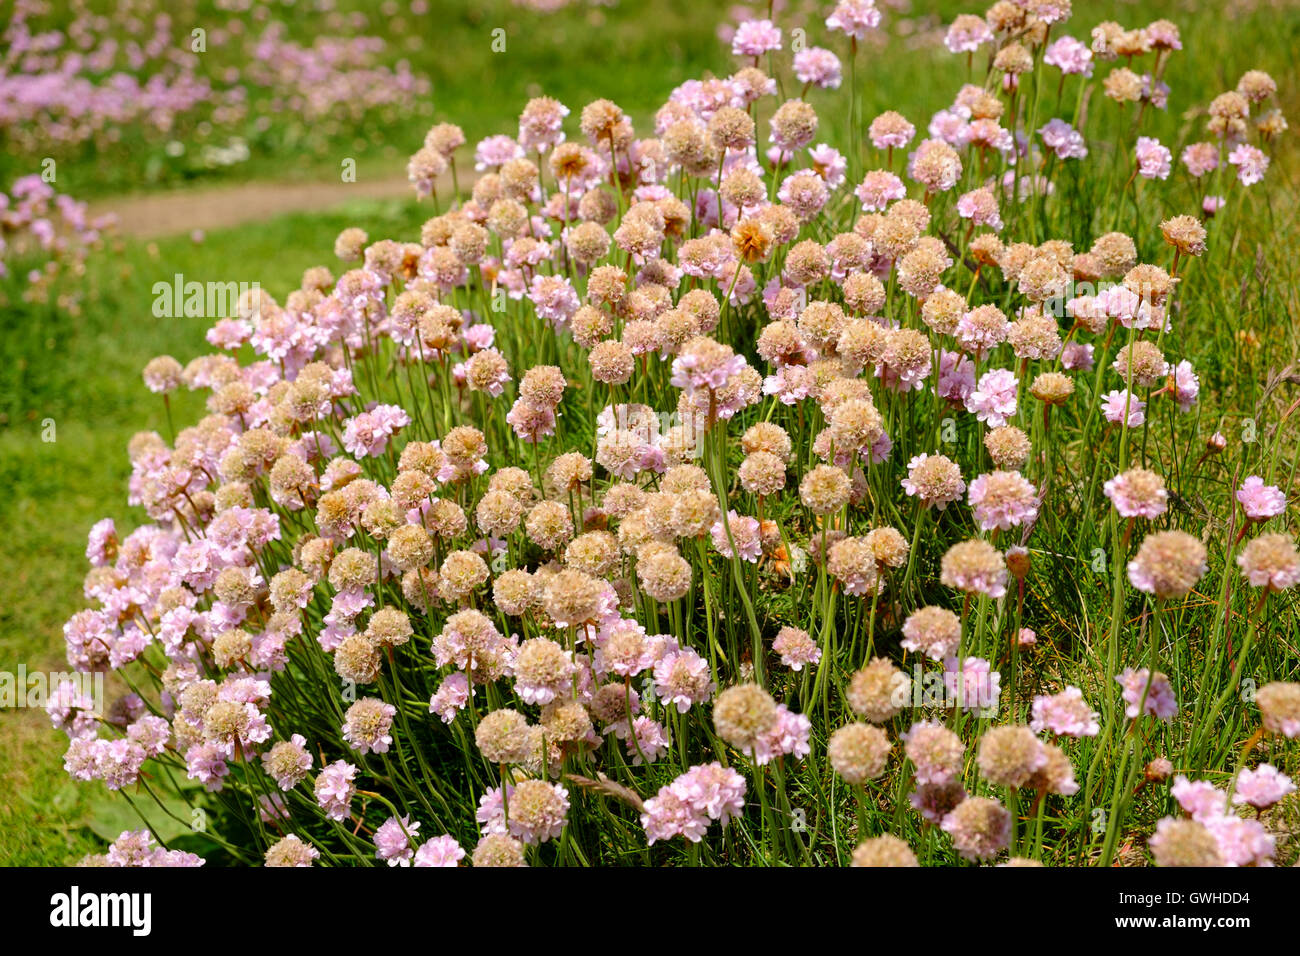 Armeria maritima or Sea Thrift coastal wildflowers flowering in early June, Cornwall, England UK - Stock Image